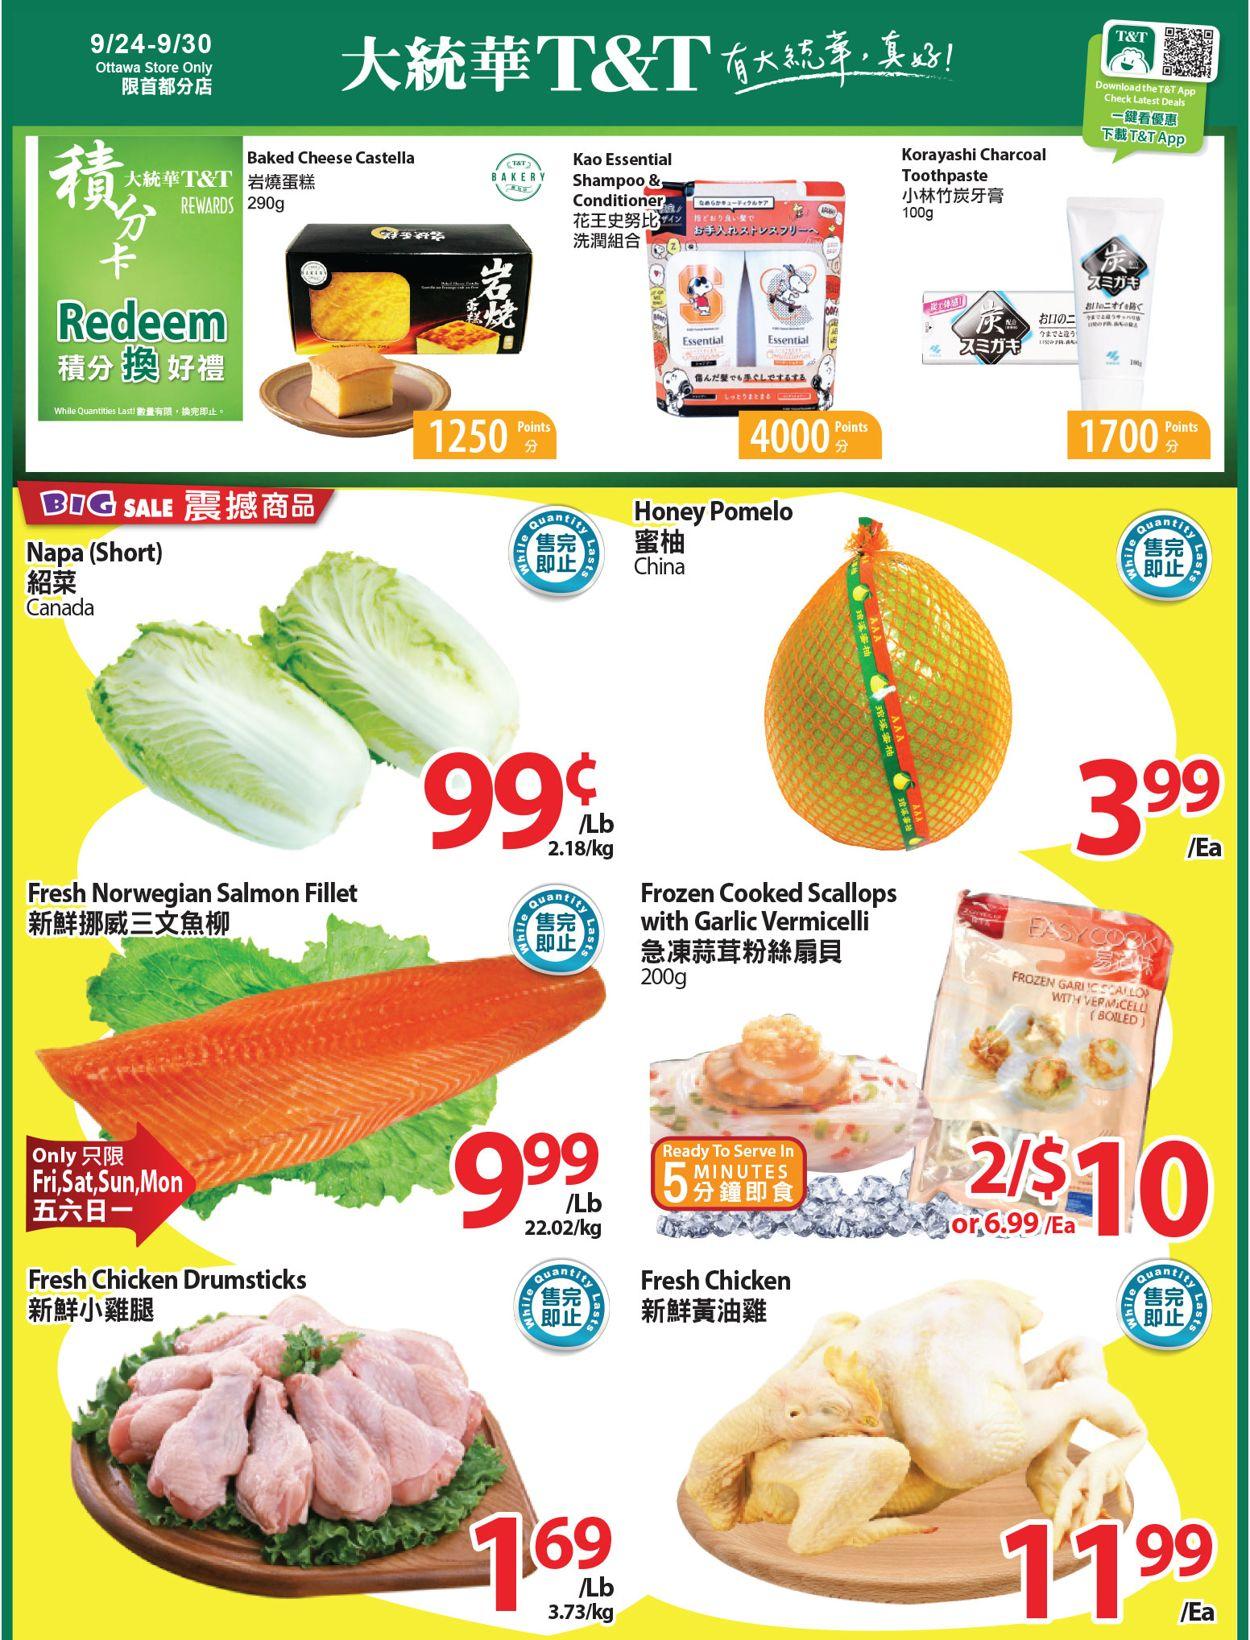 T&T Supermarket - Ottawa Flyer - 09/24-09/30/2021